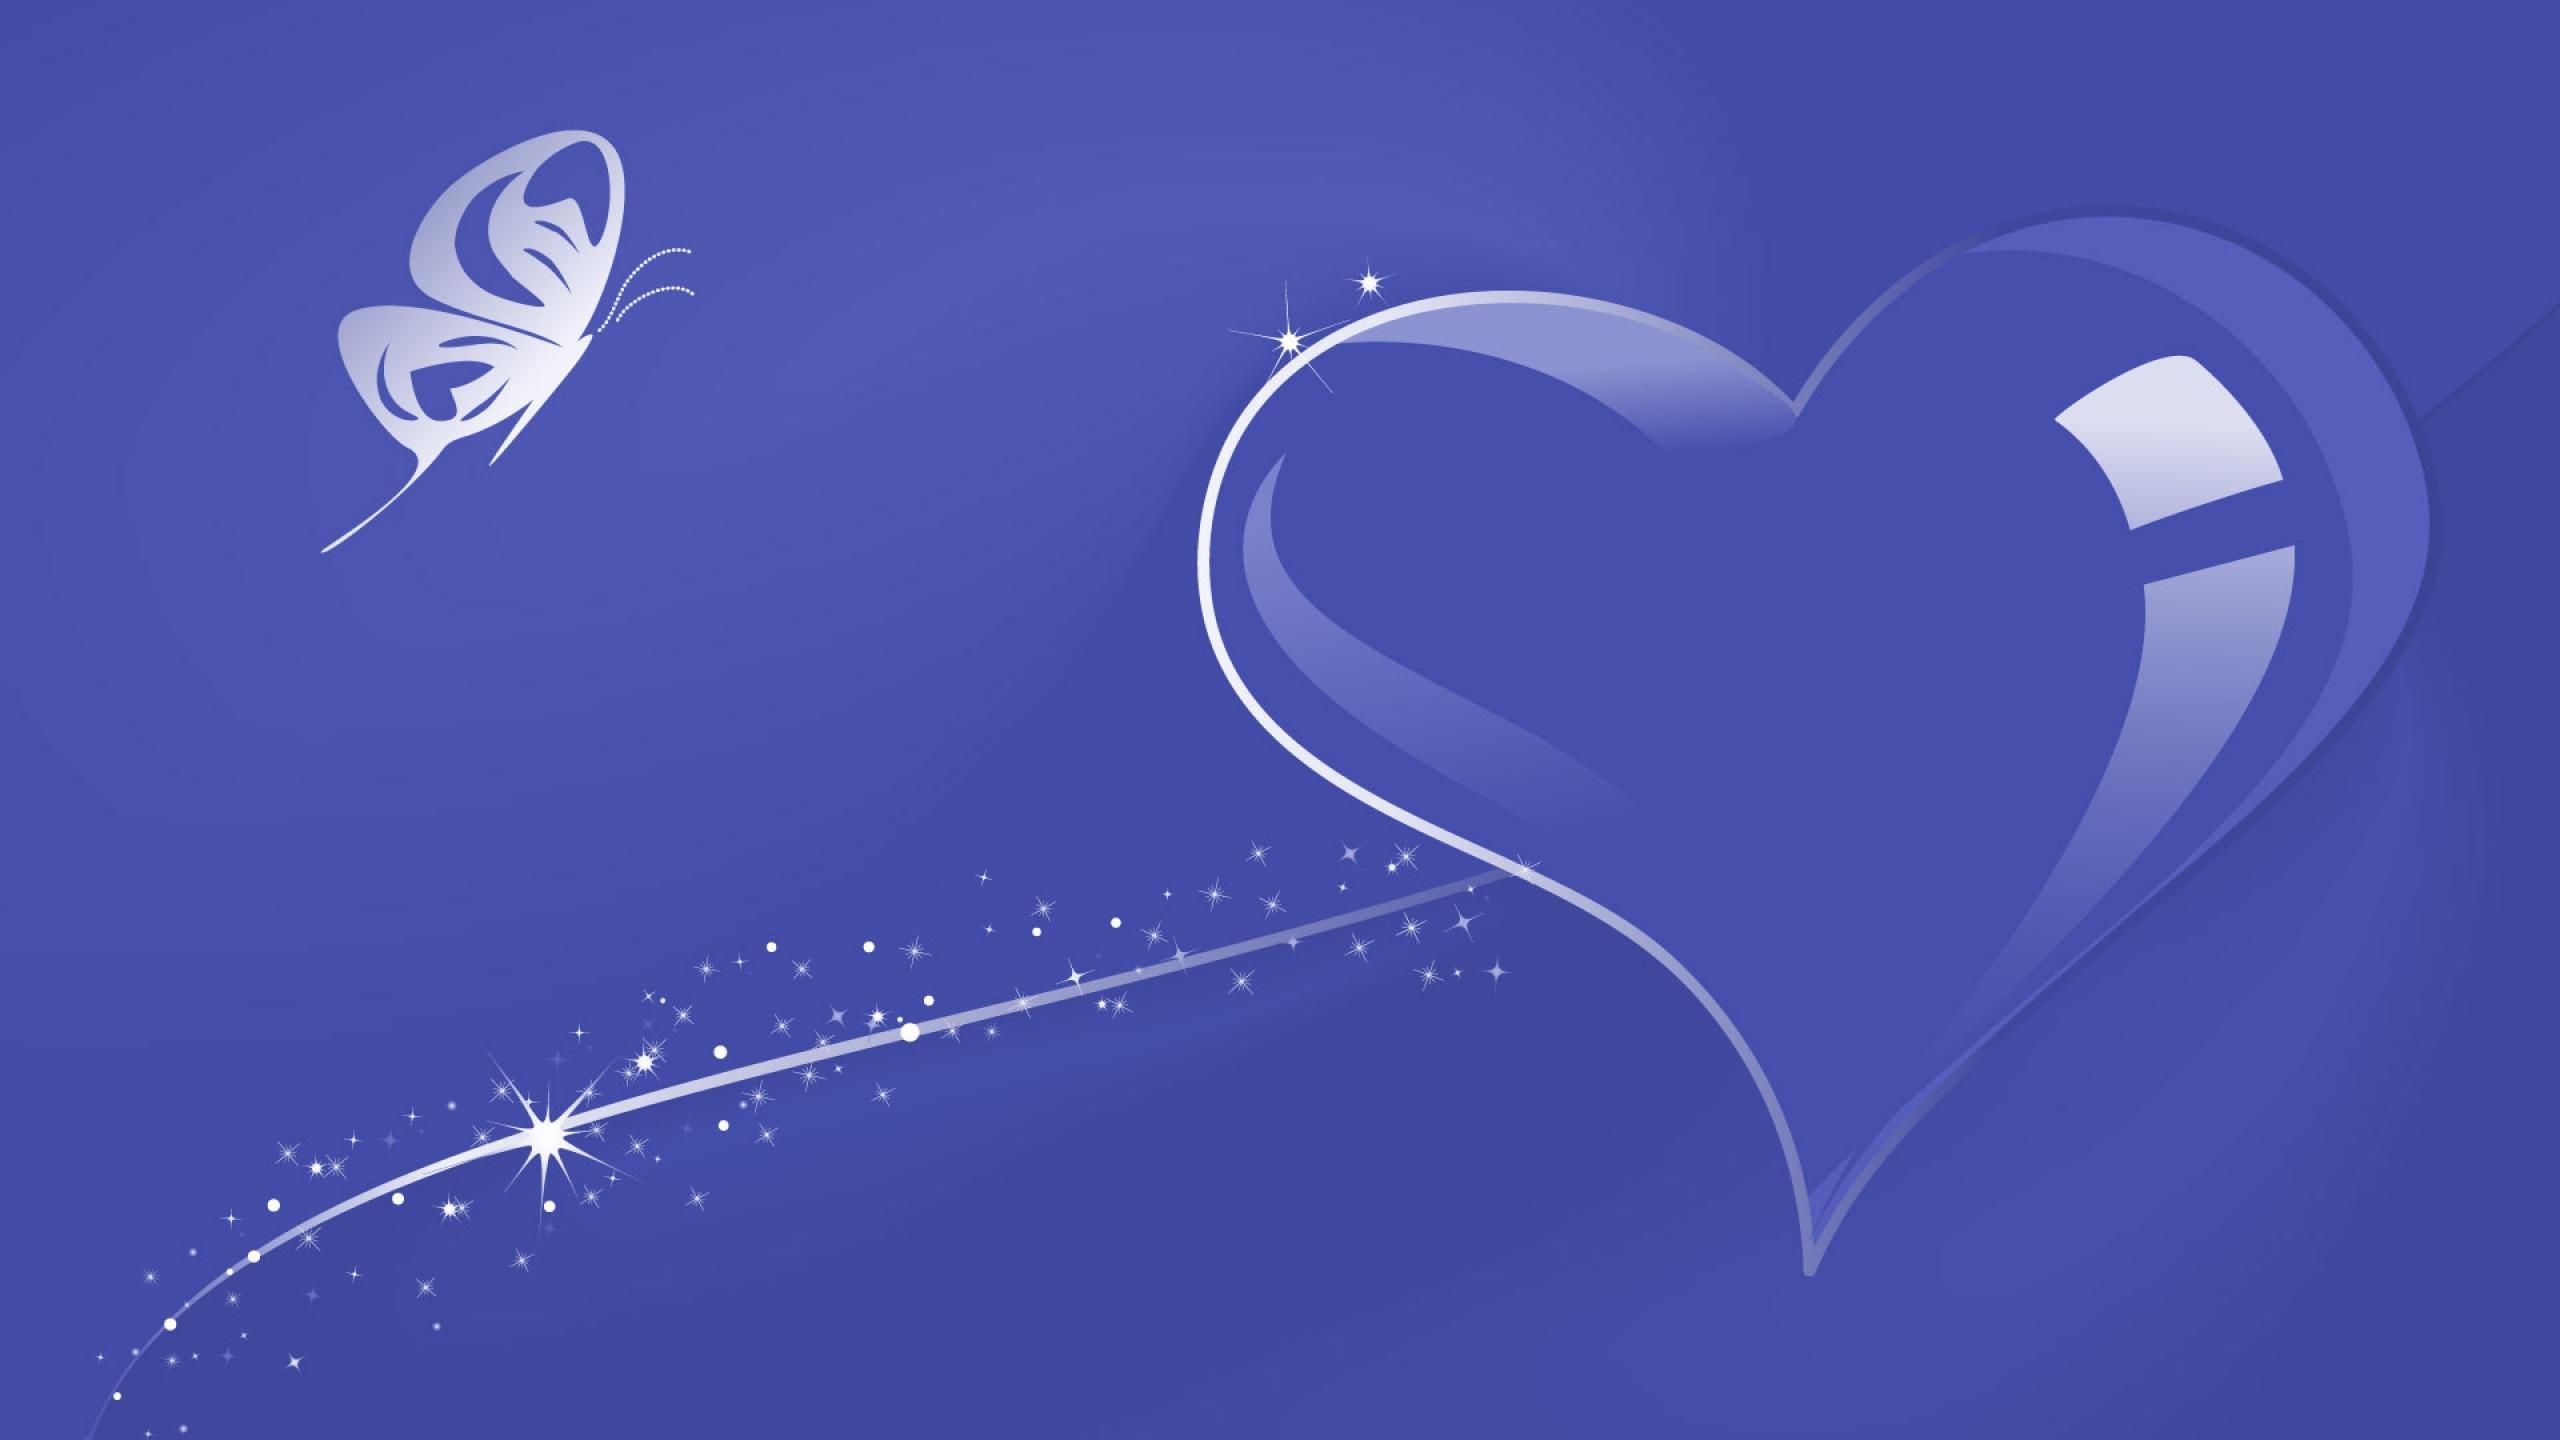 heart wallpapers bubble